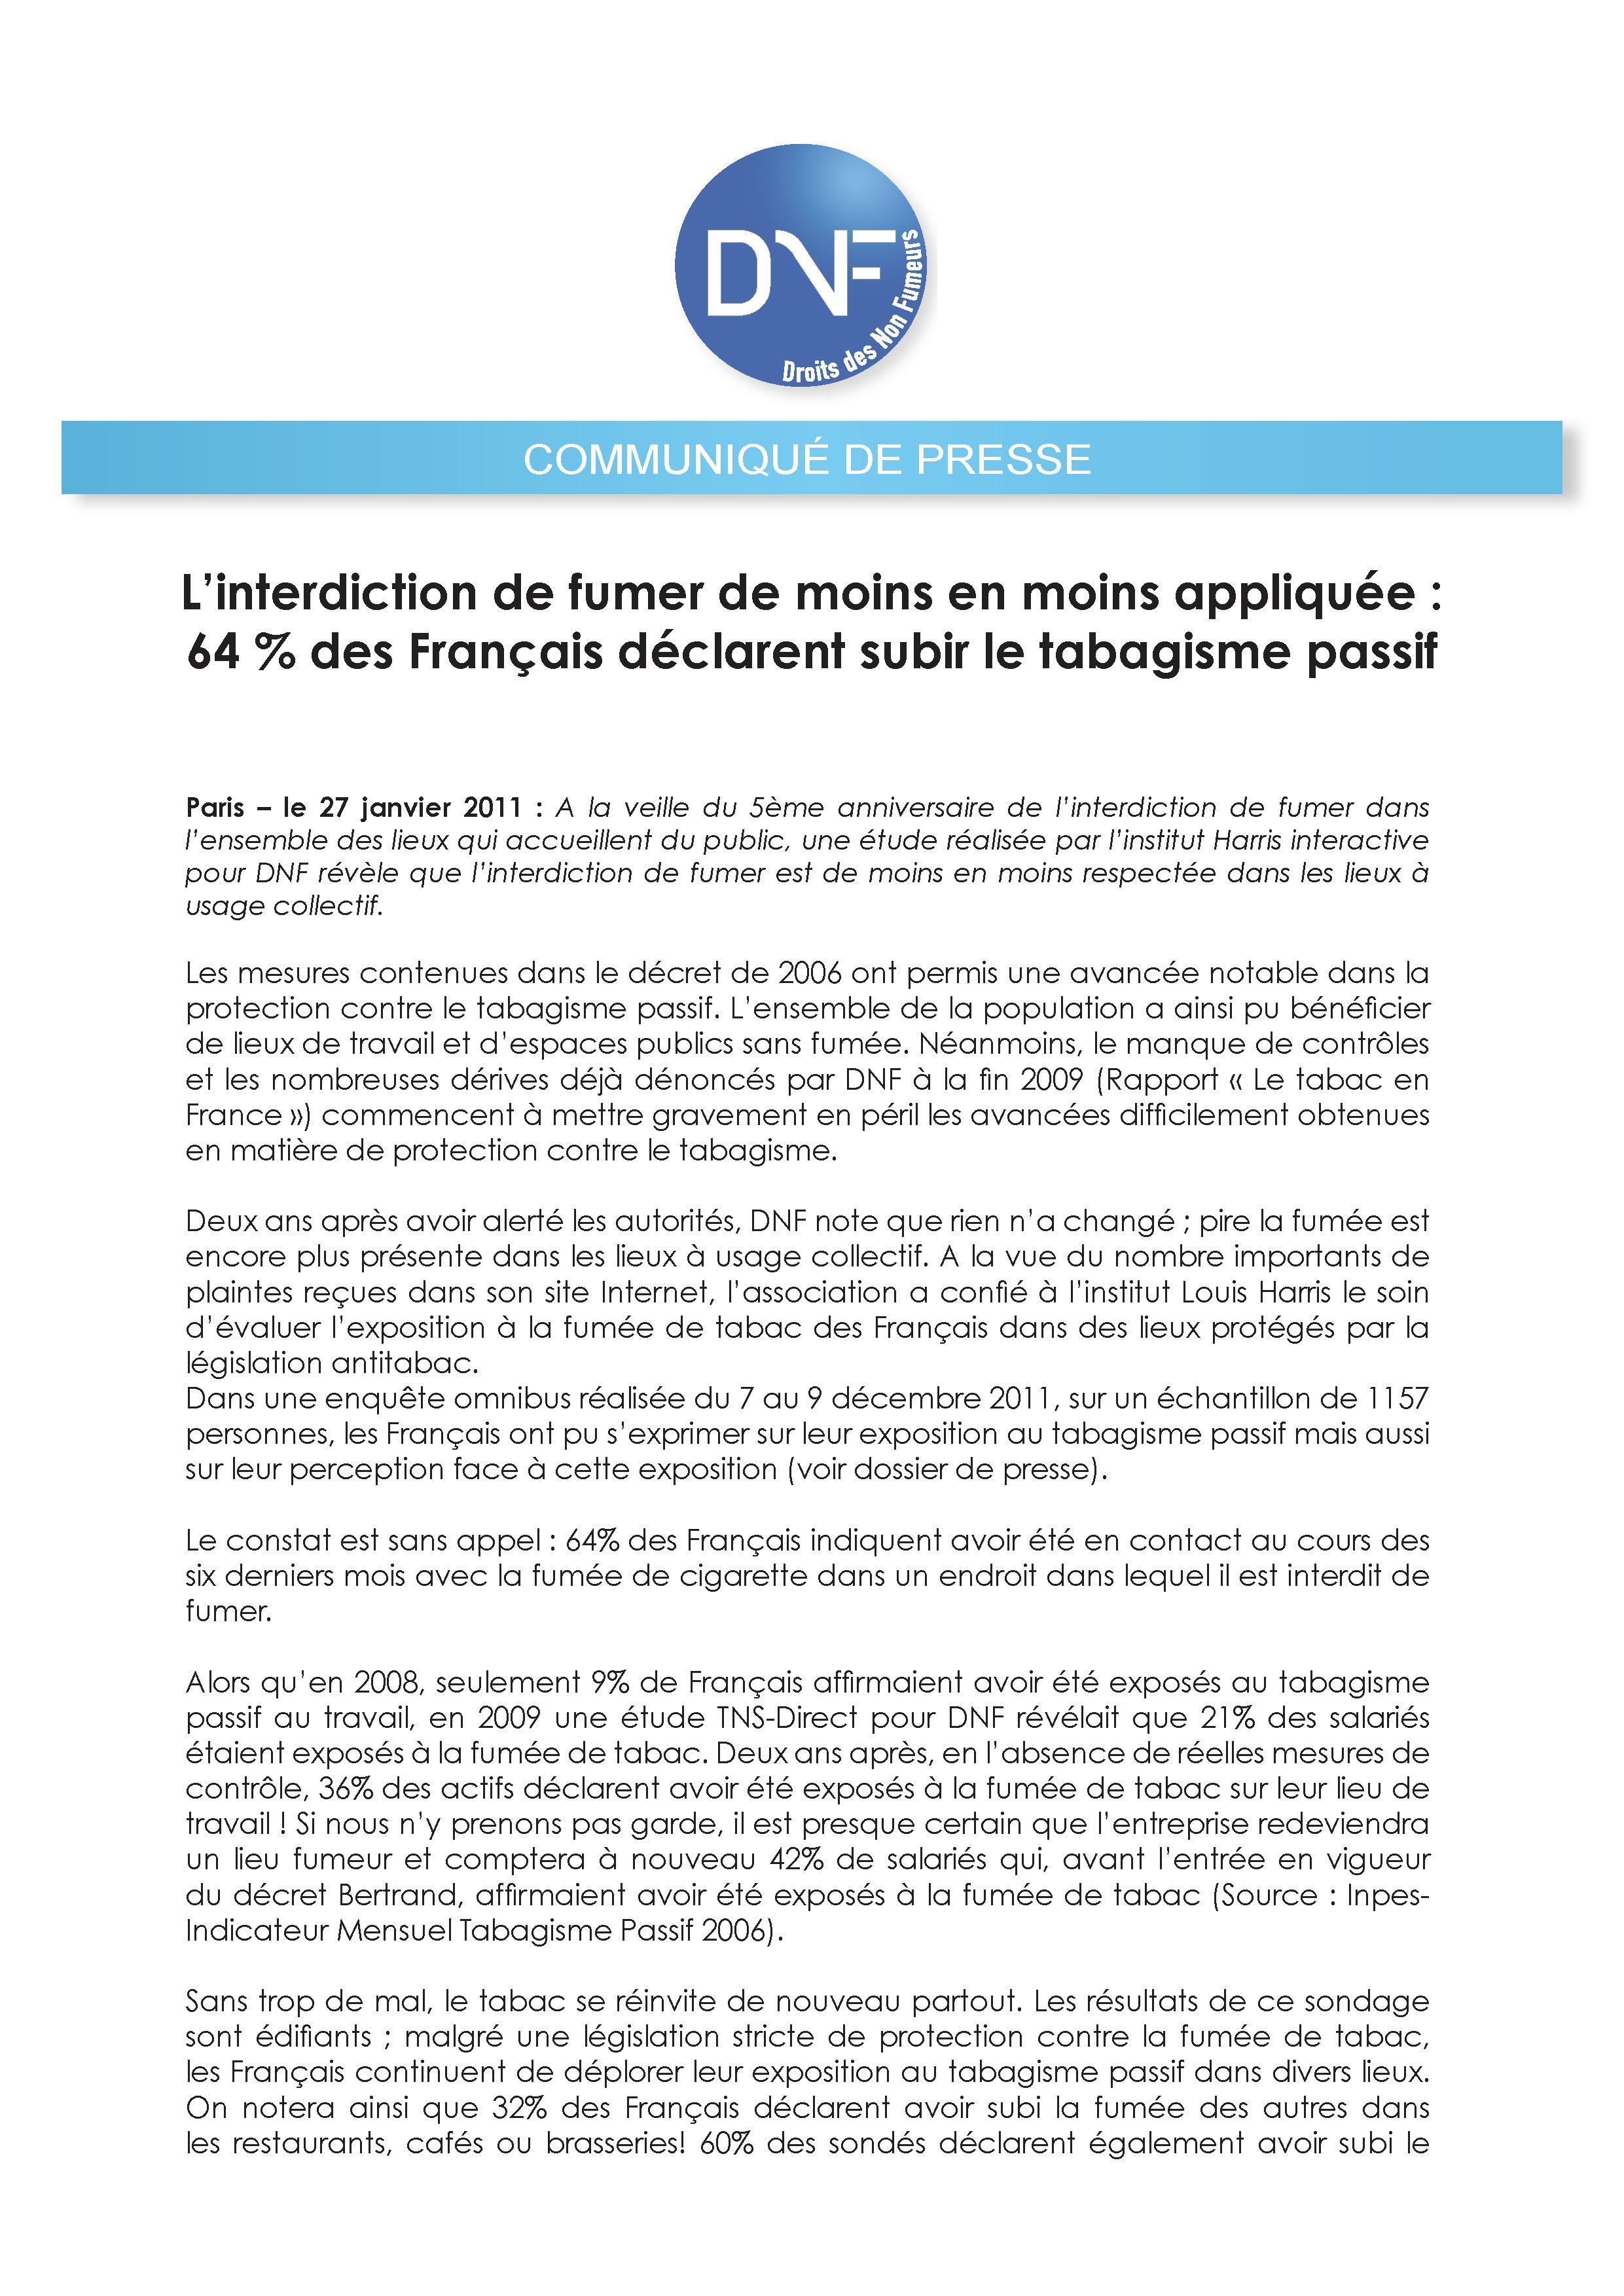 DNF-CP_l'interdiction-de-fumer-de-moins-en-moins-appliquee-27jan2012_Page_1.jpg